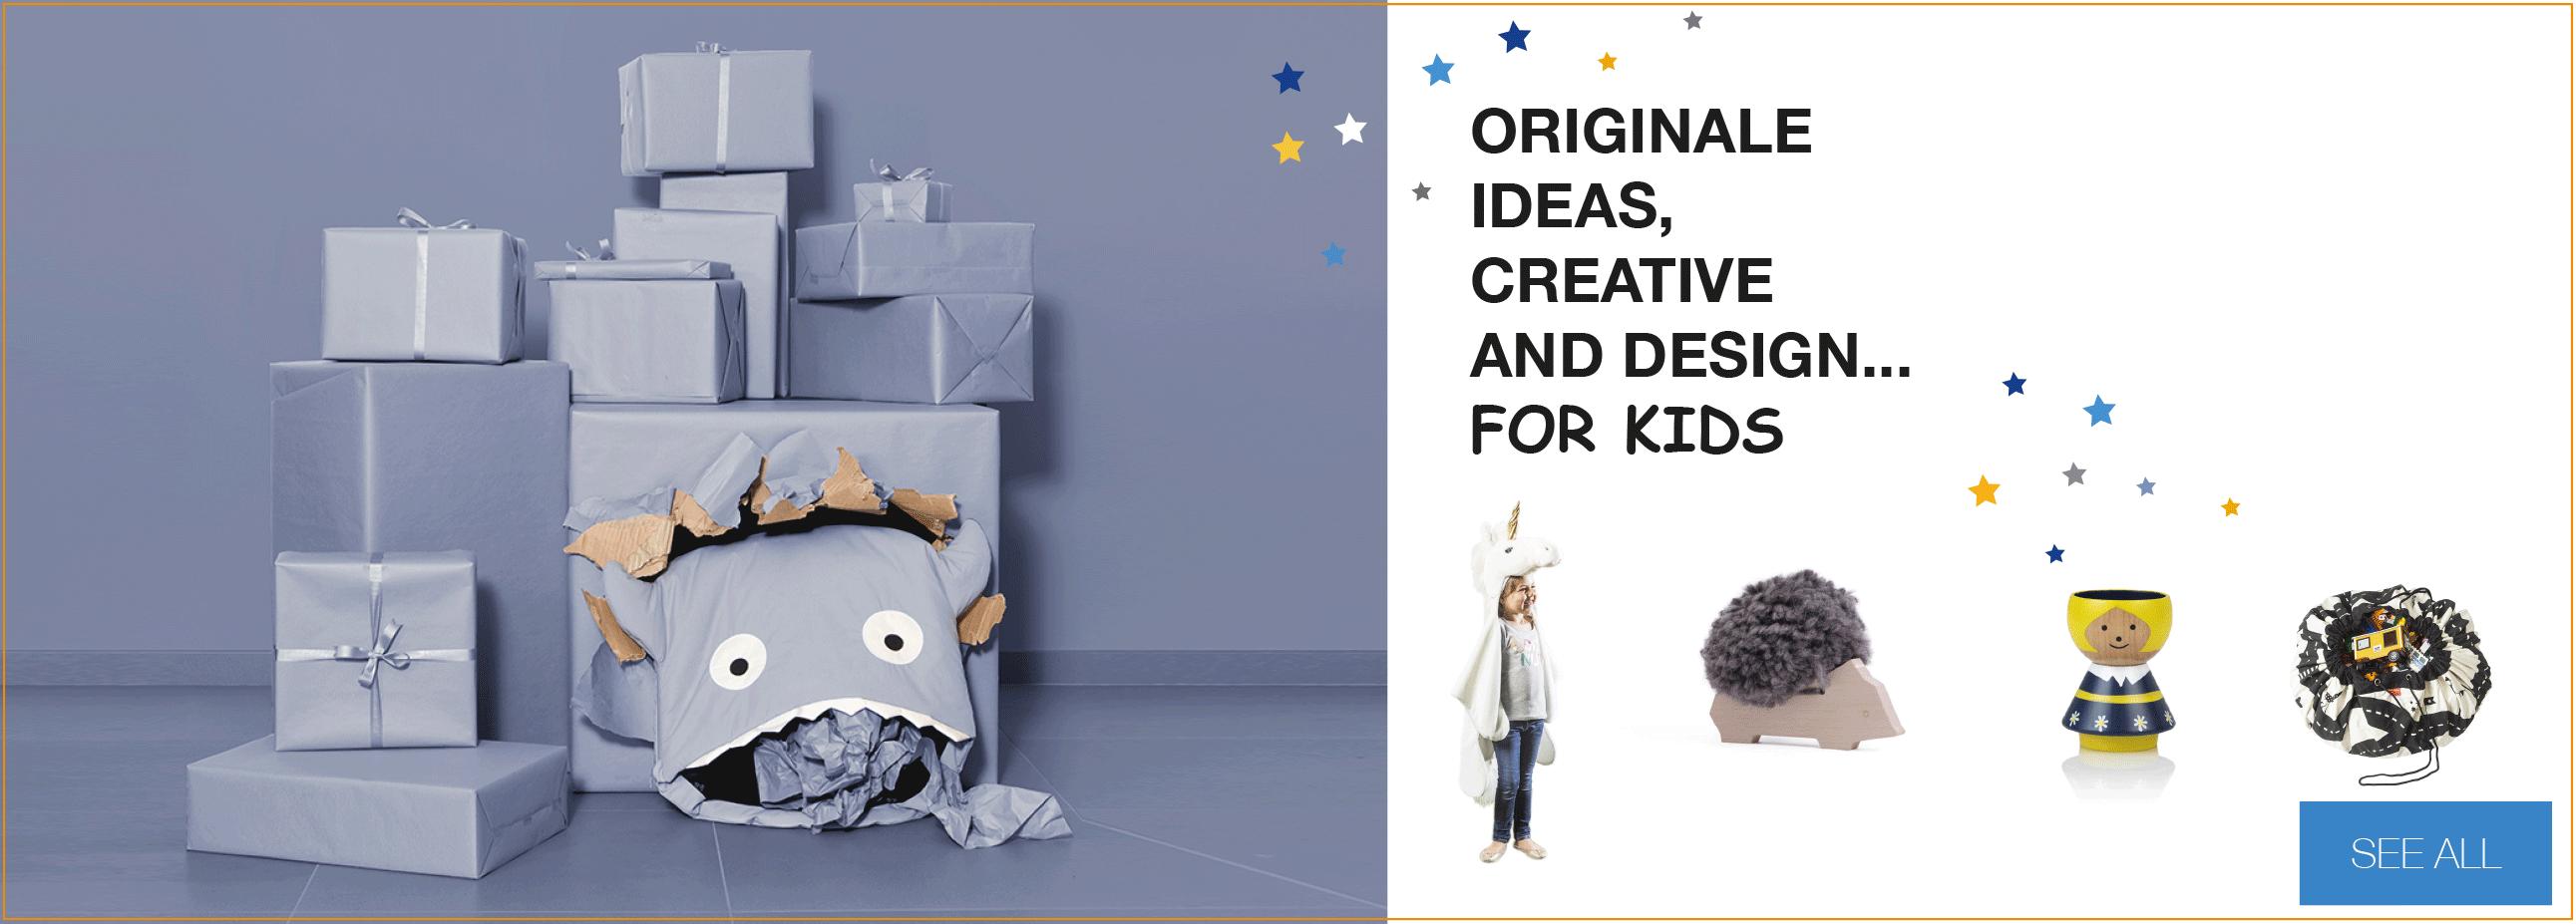 Original gift ideas for KIDS